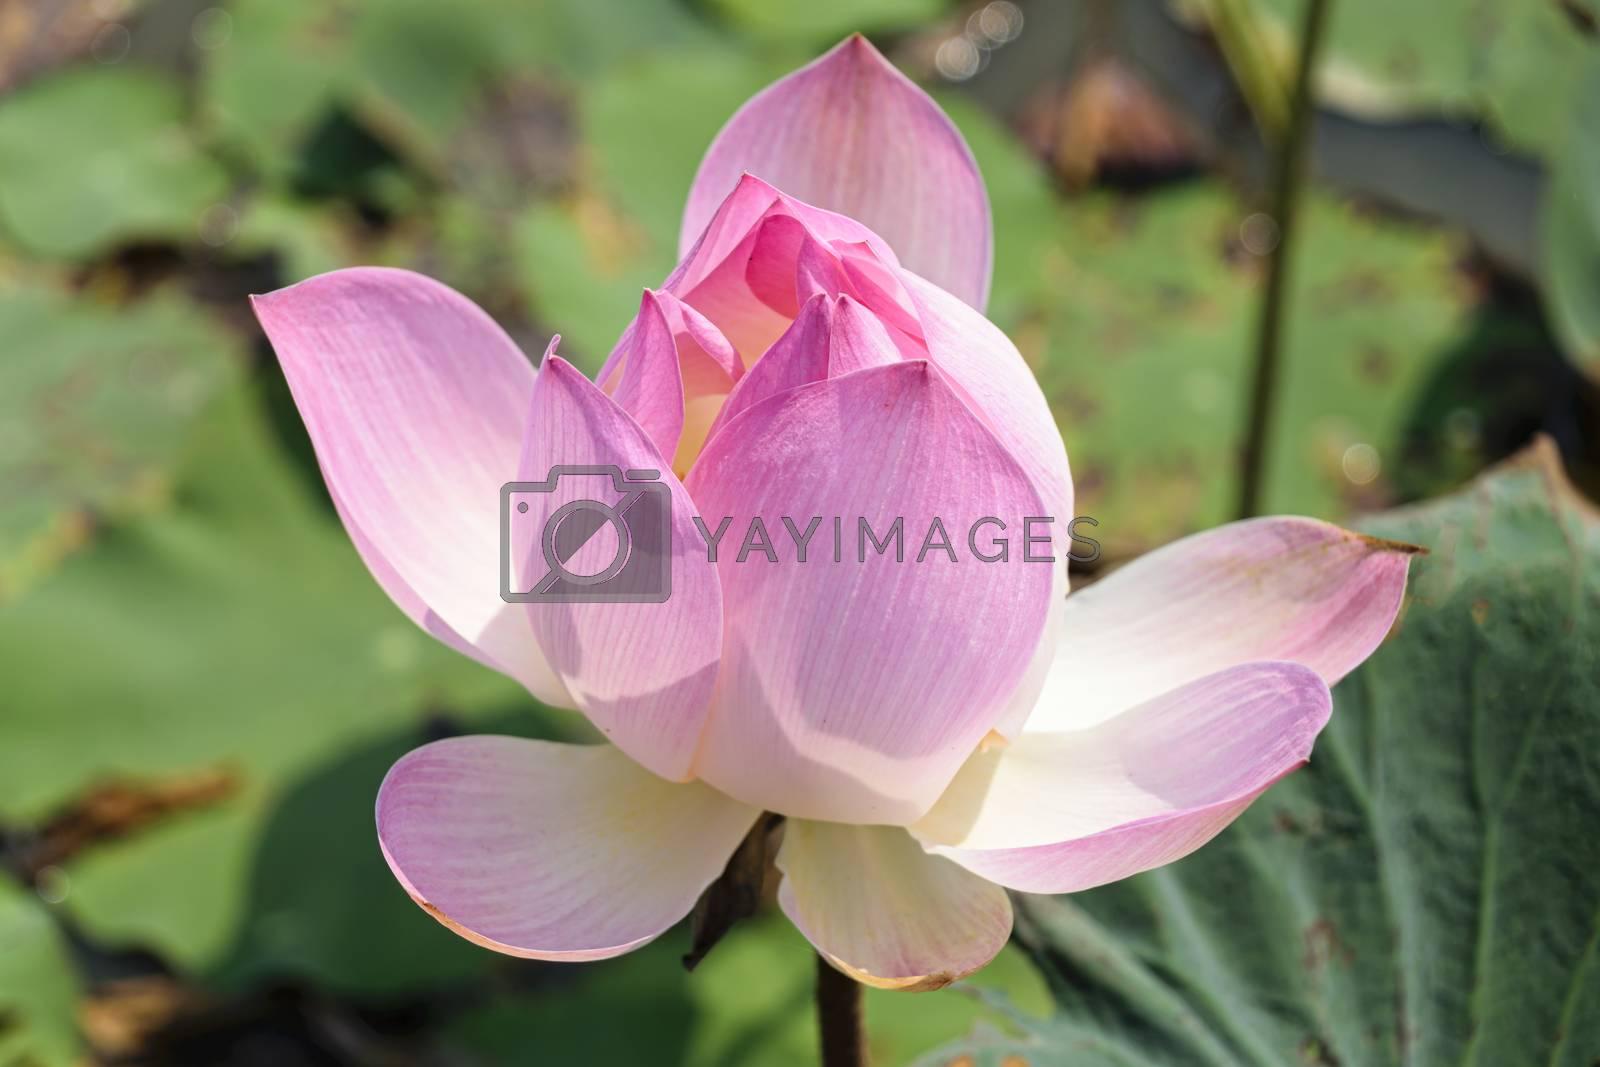 Cambodia, Tonle Sap - March 2016: Single lotus flower